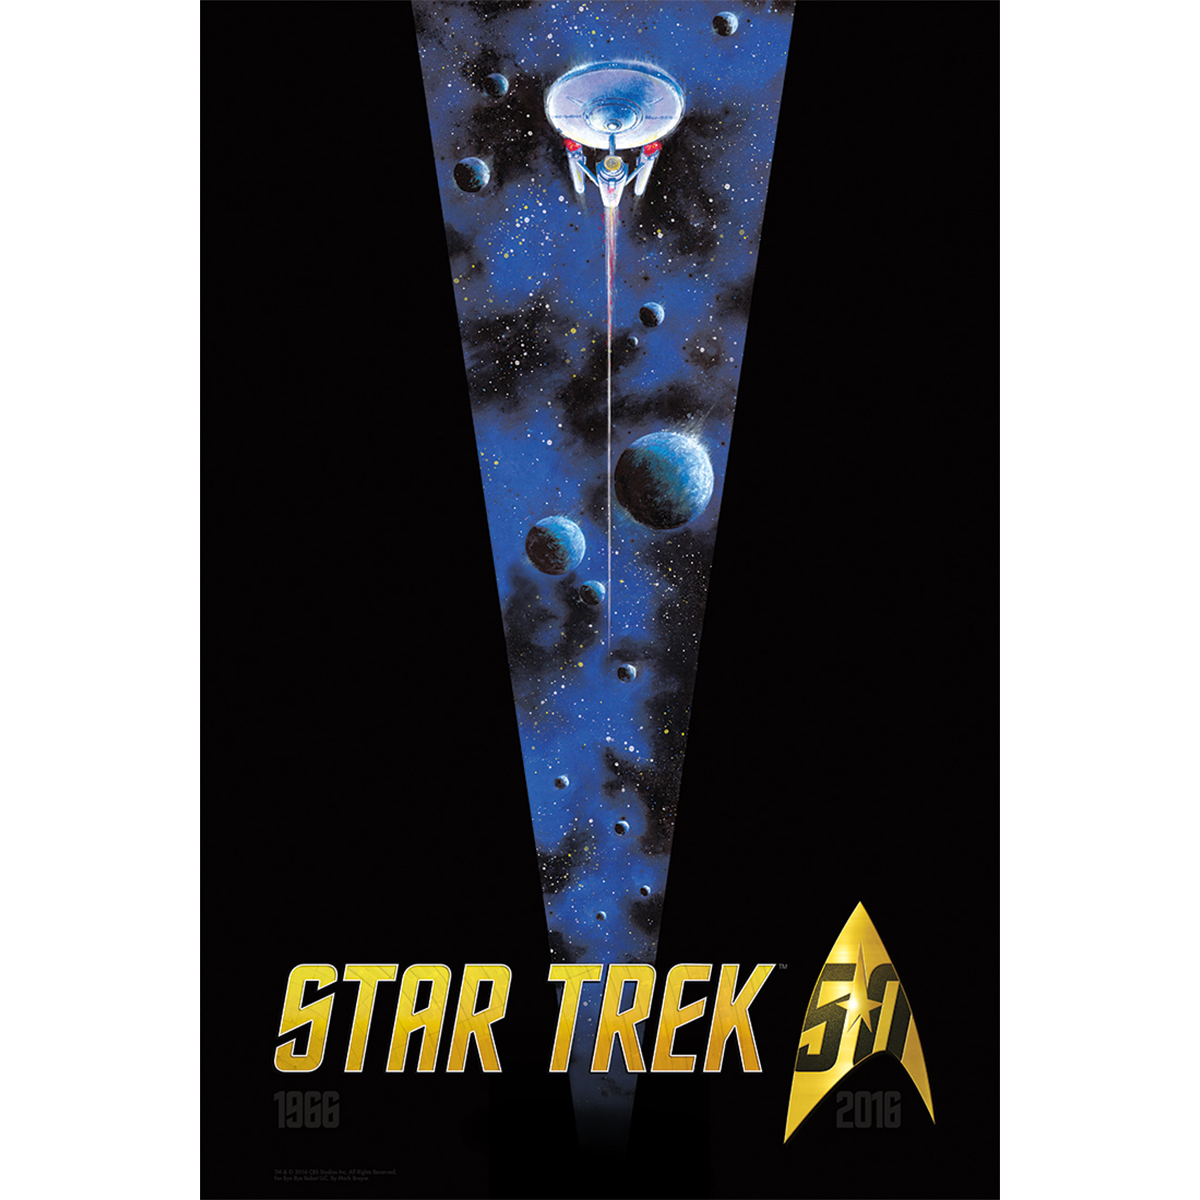 Star Trek 50th Anniversary Poster [16x18]